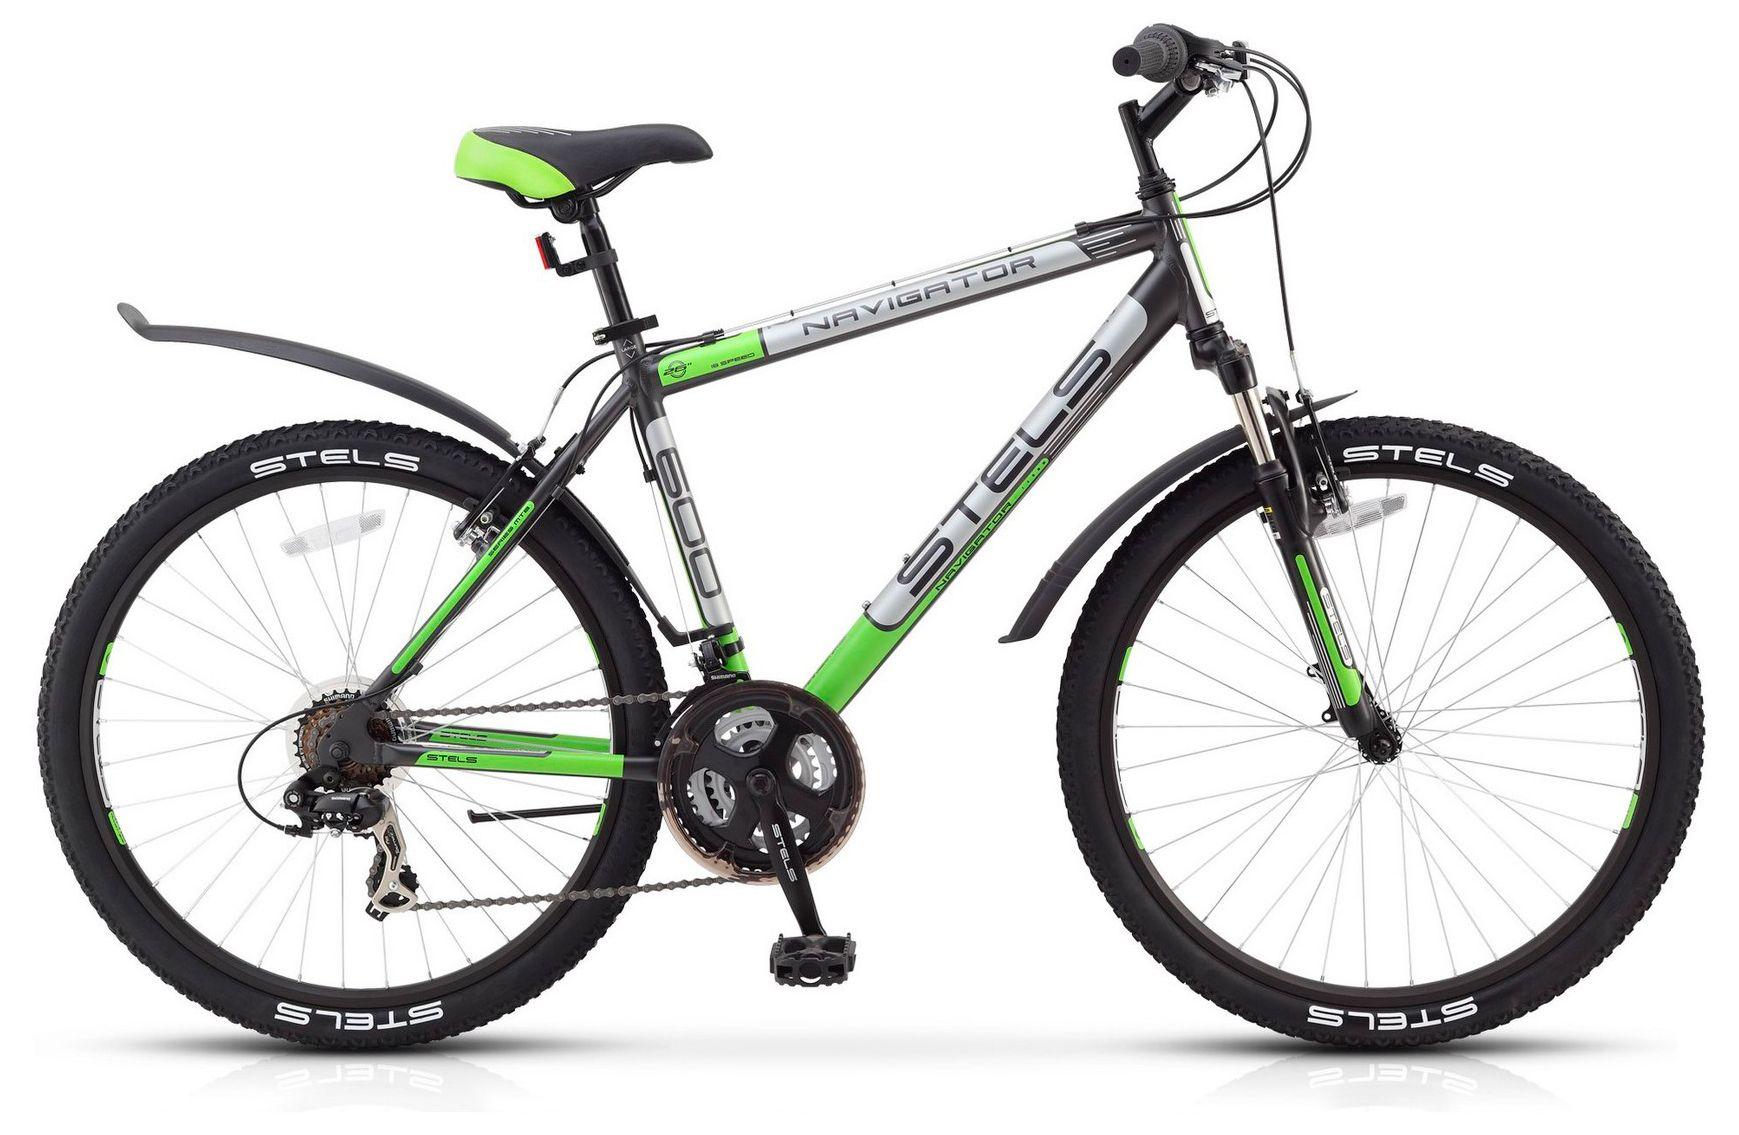 Велосипед Stels Navigator 600 V 26 (V030) 2018 велосипед stels navigator 550 v 26 v030 2017